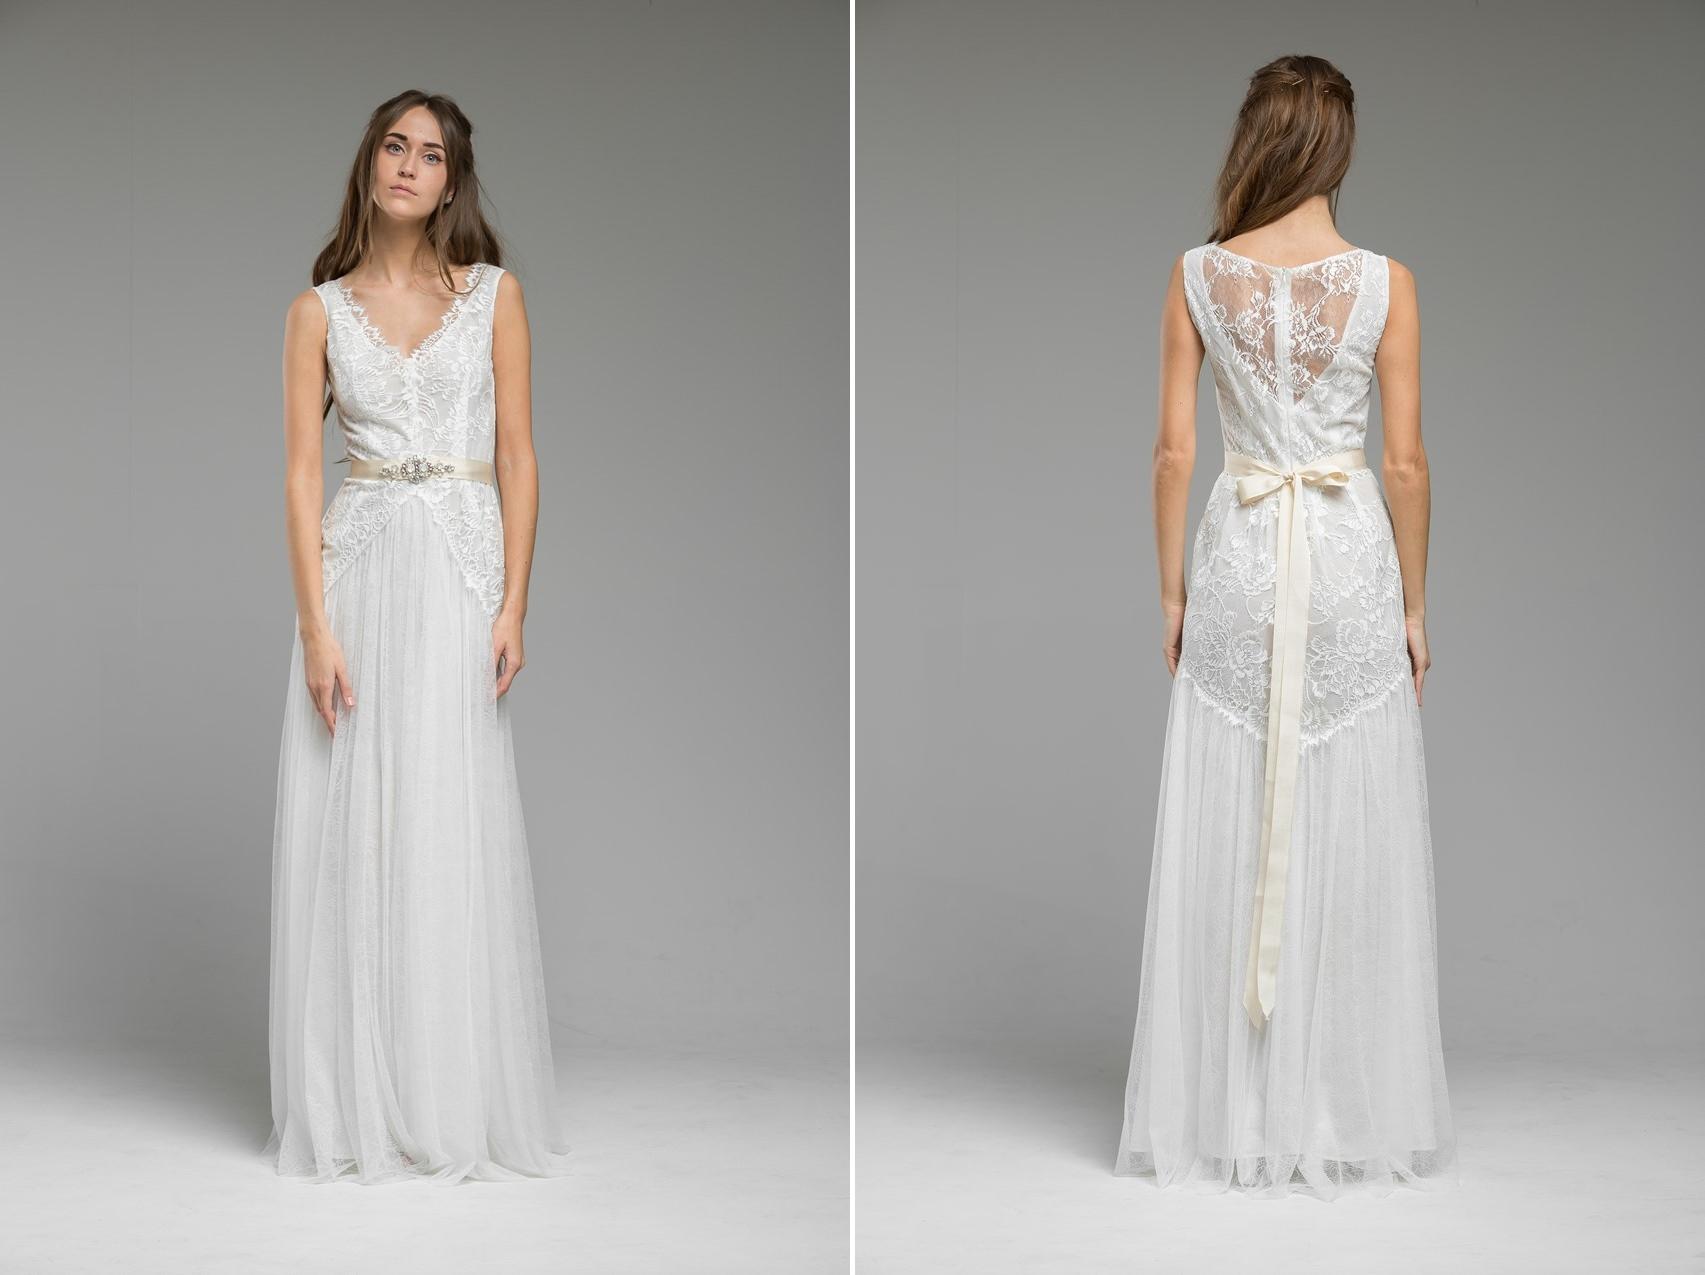 Romantic Lace Wedding Dress 'Opal' from Katya Katya Shehurina